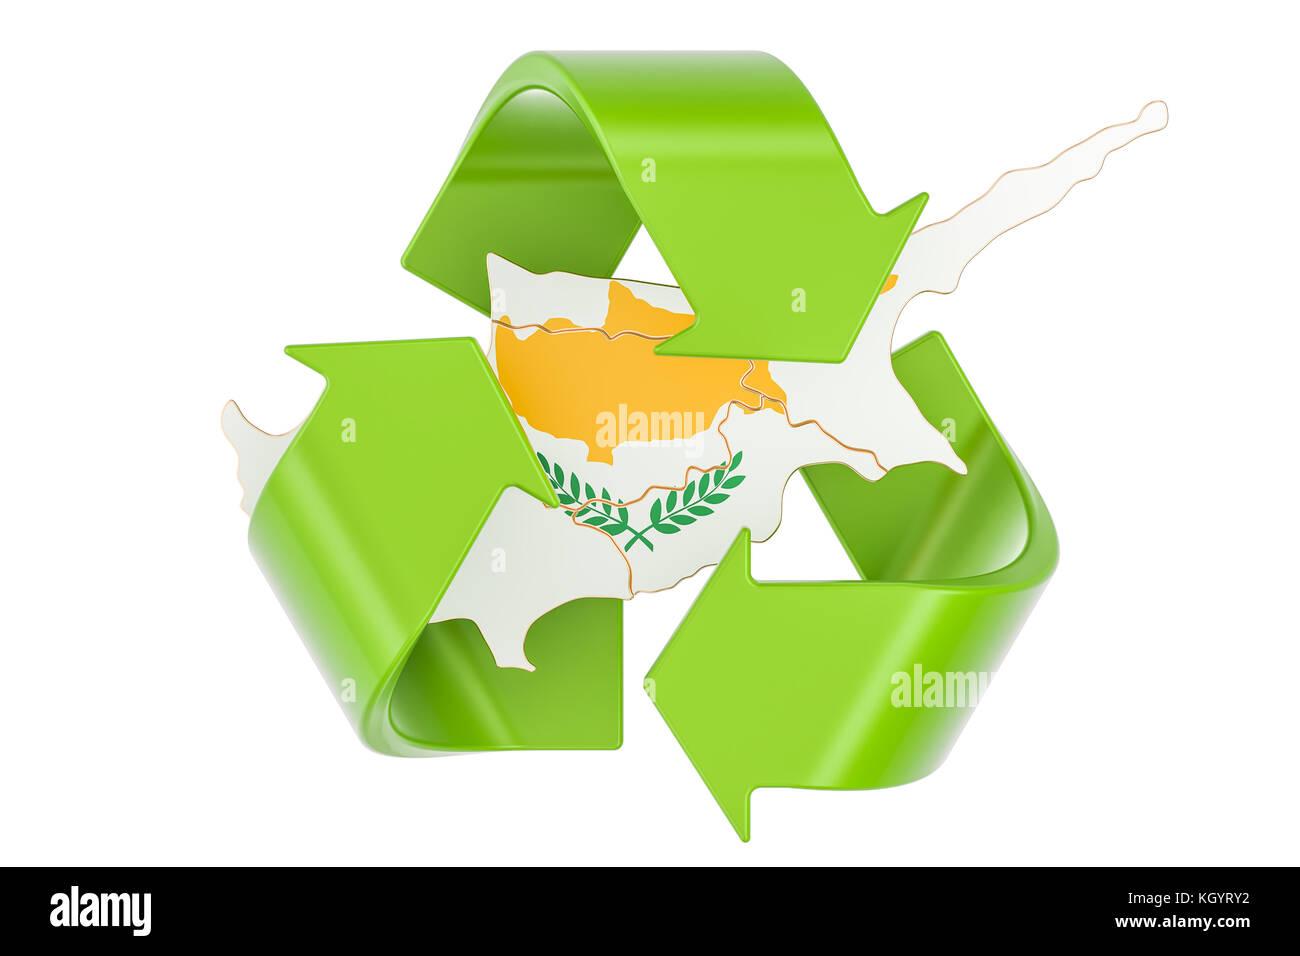 Recycling symbol flag stock photos recycling symbol flag stock recycling in cyprus concept 3d rendering isolated on white background stock image buycottarizona Choice Image